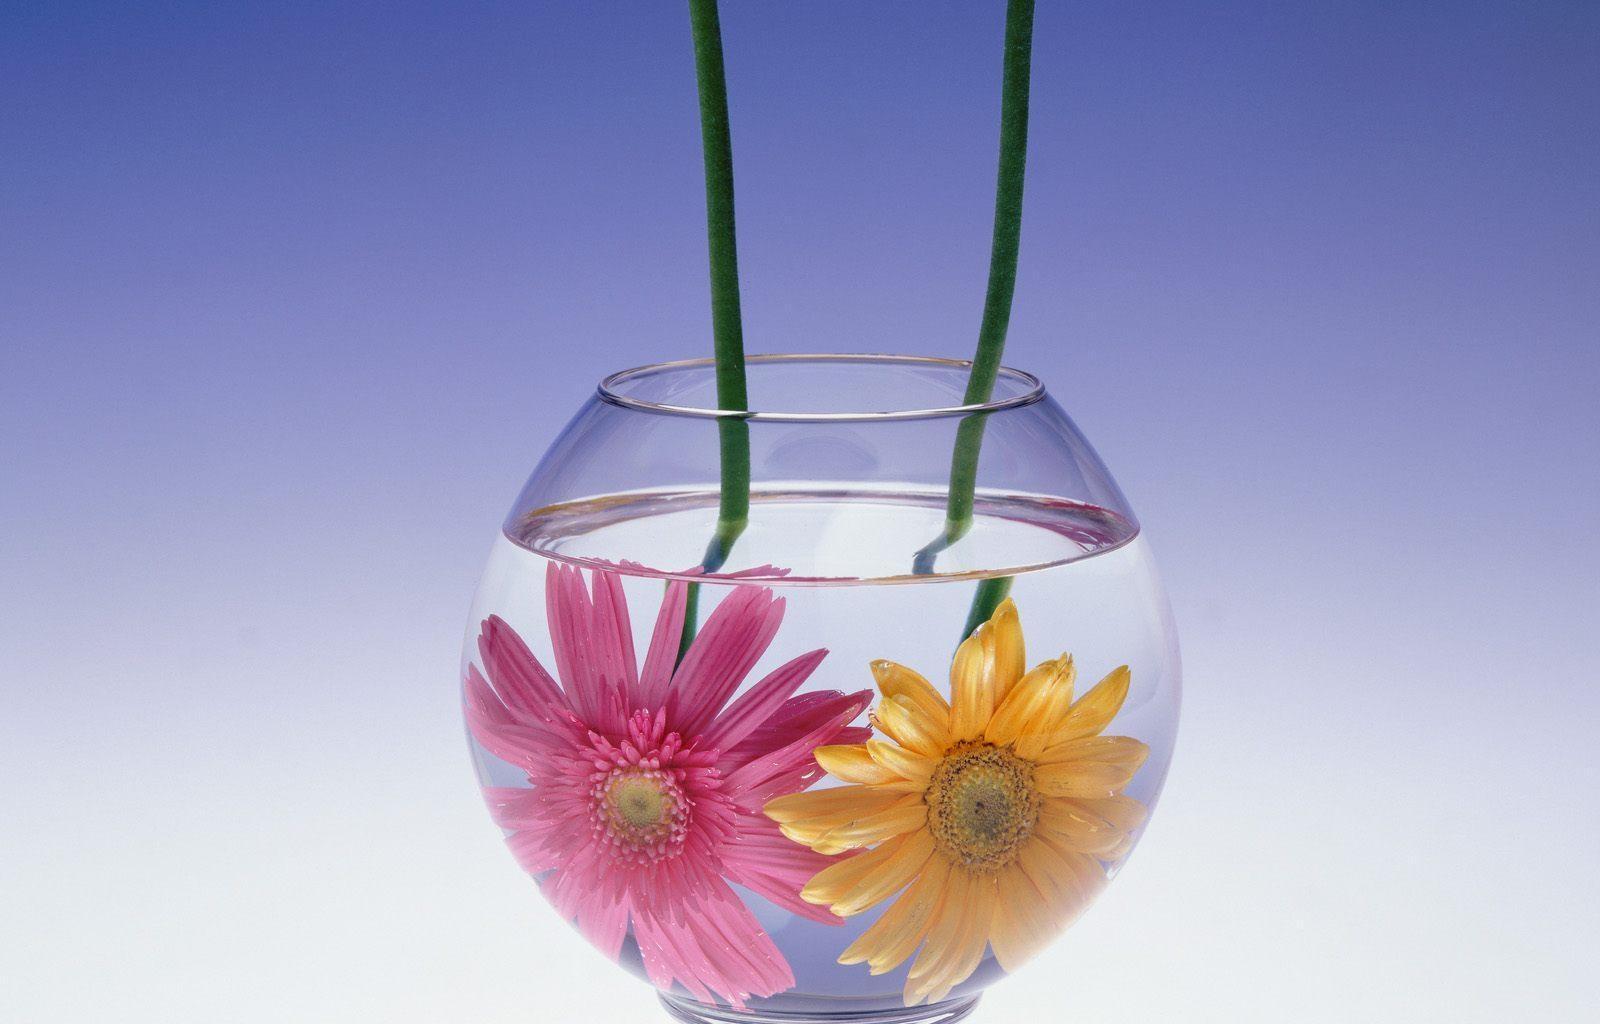 132070 Screensavers and Wallpapers Aquarium for phone. Download Flowers, Water, Gerberas, Couple, Pair, Aquarium pictures for free